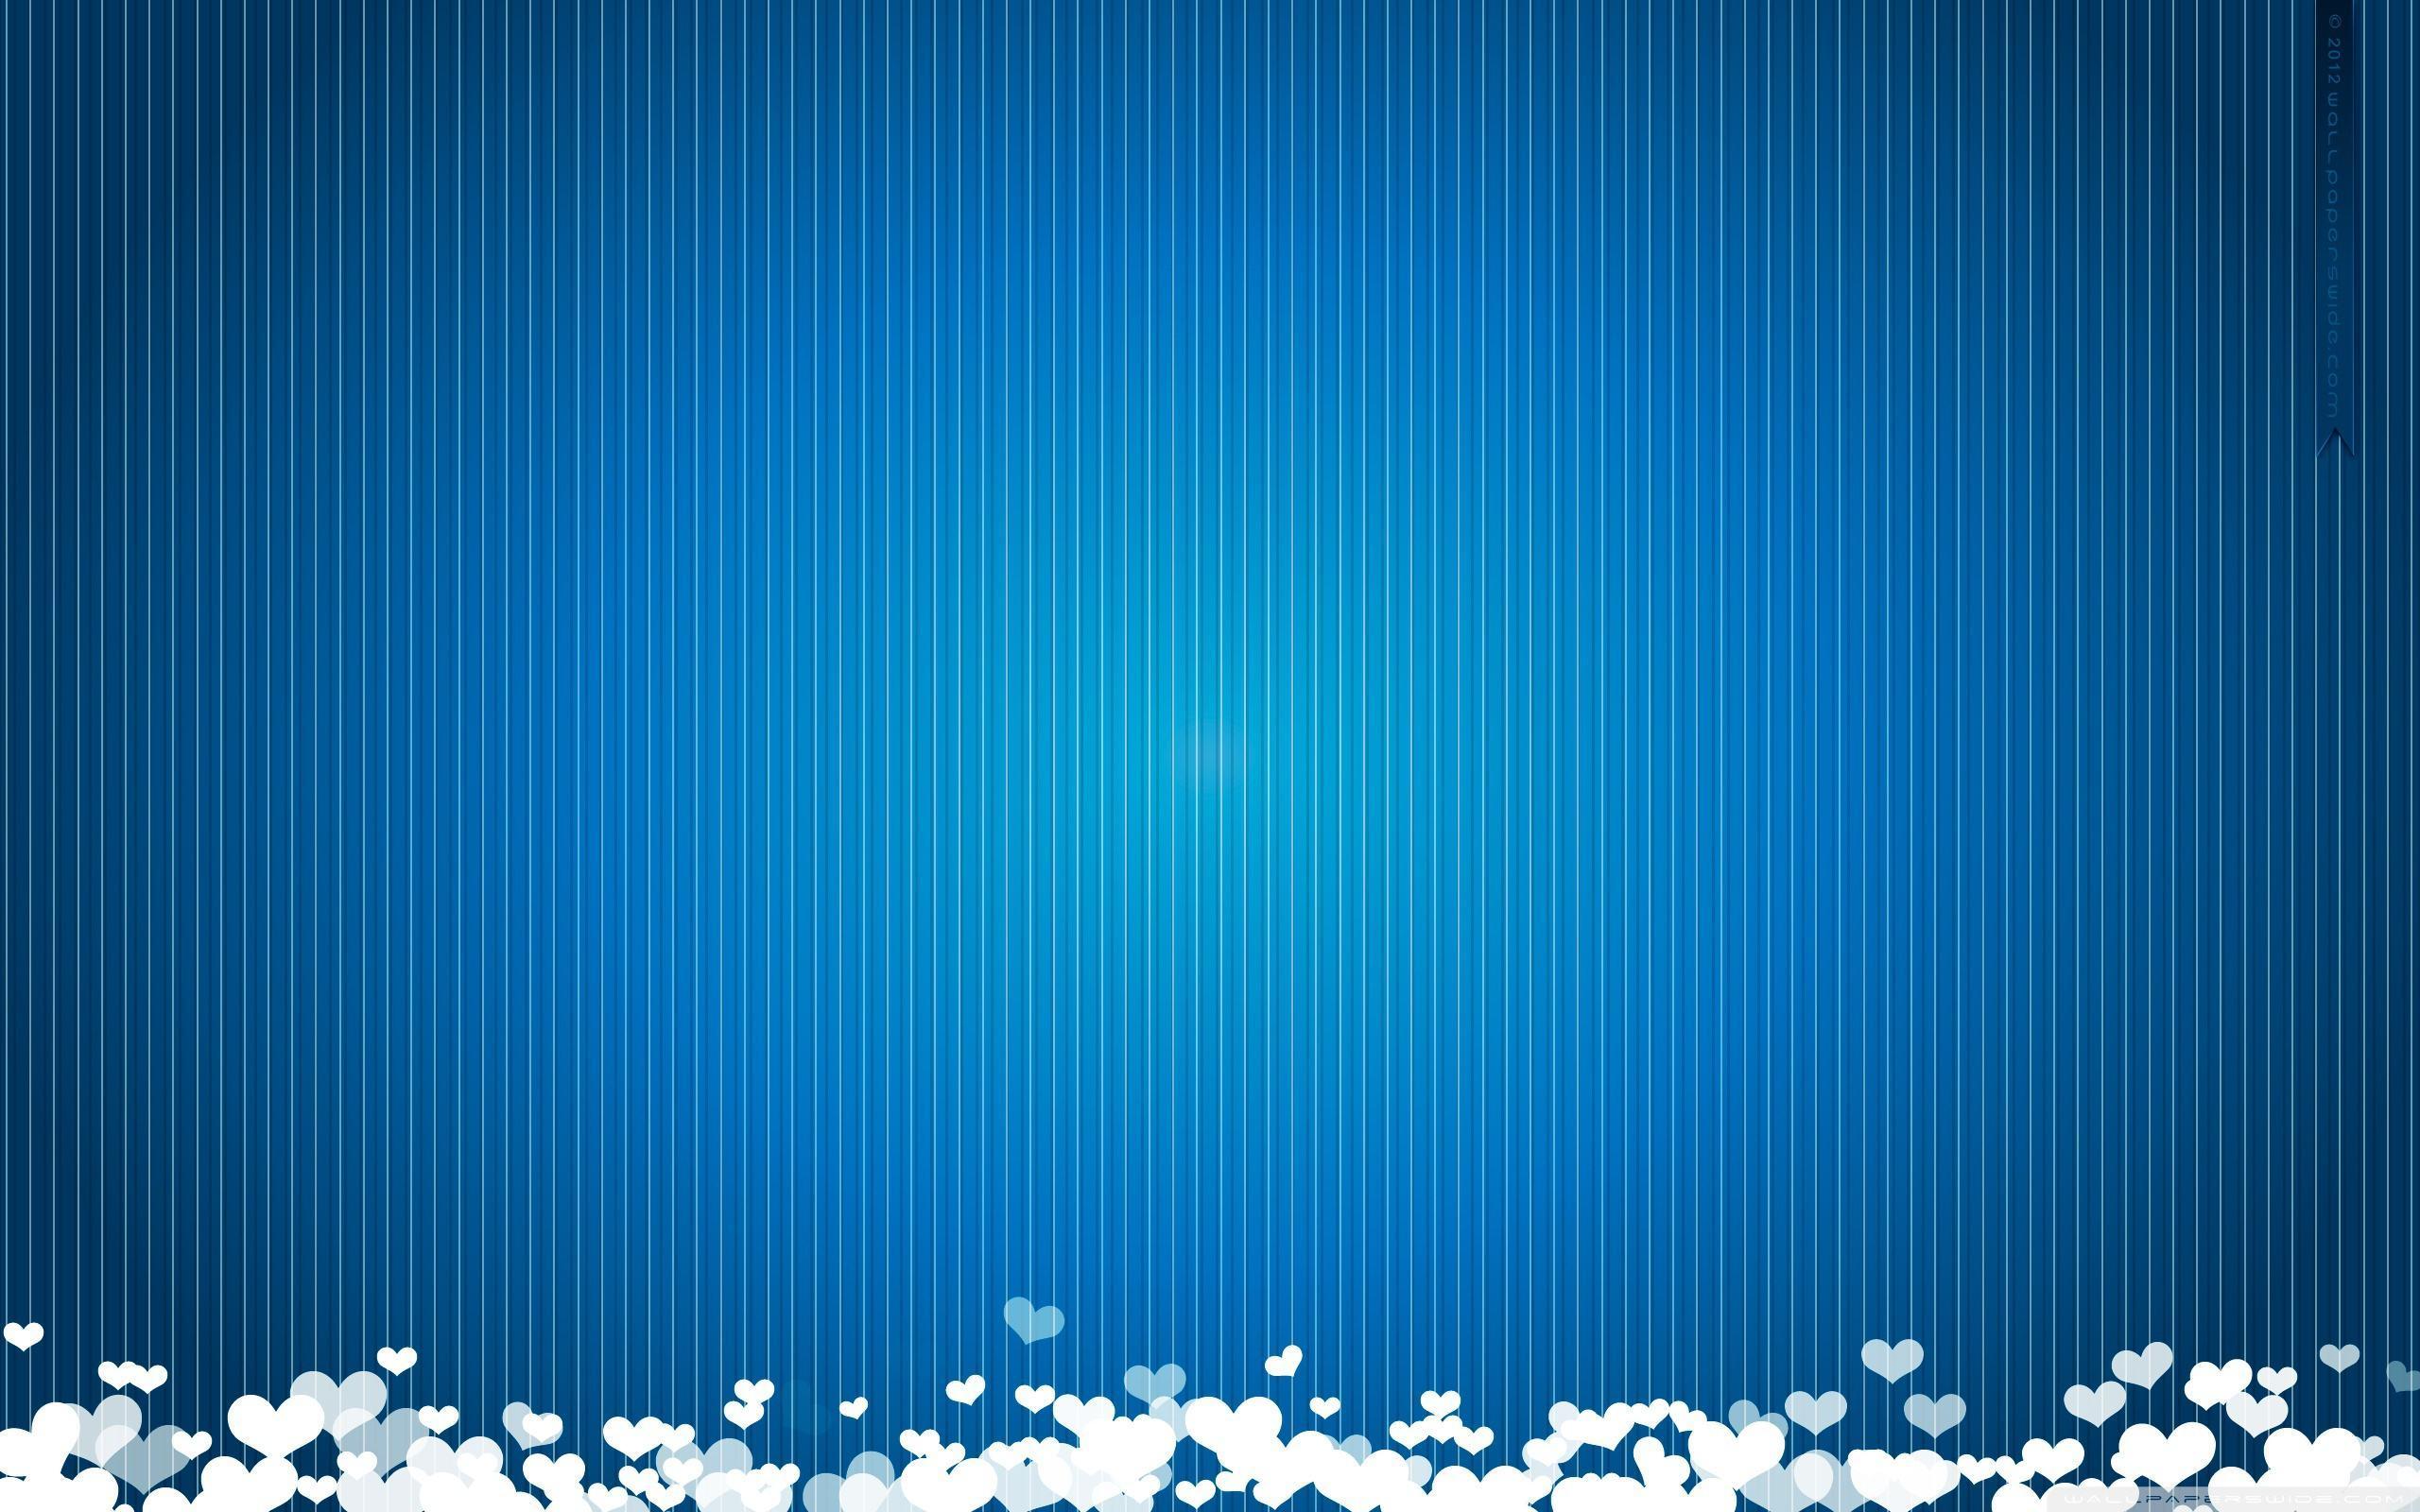 Blue Backgrounds Hd Wallpaper Cave